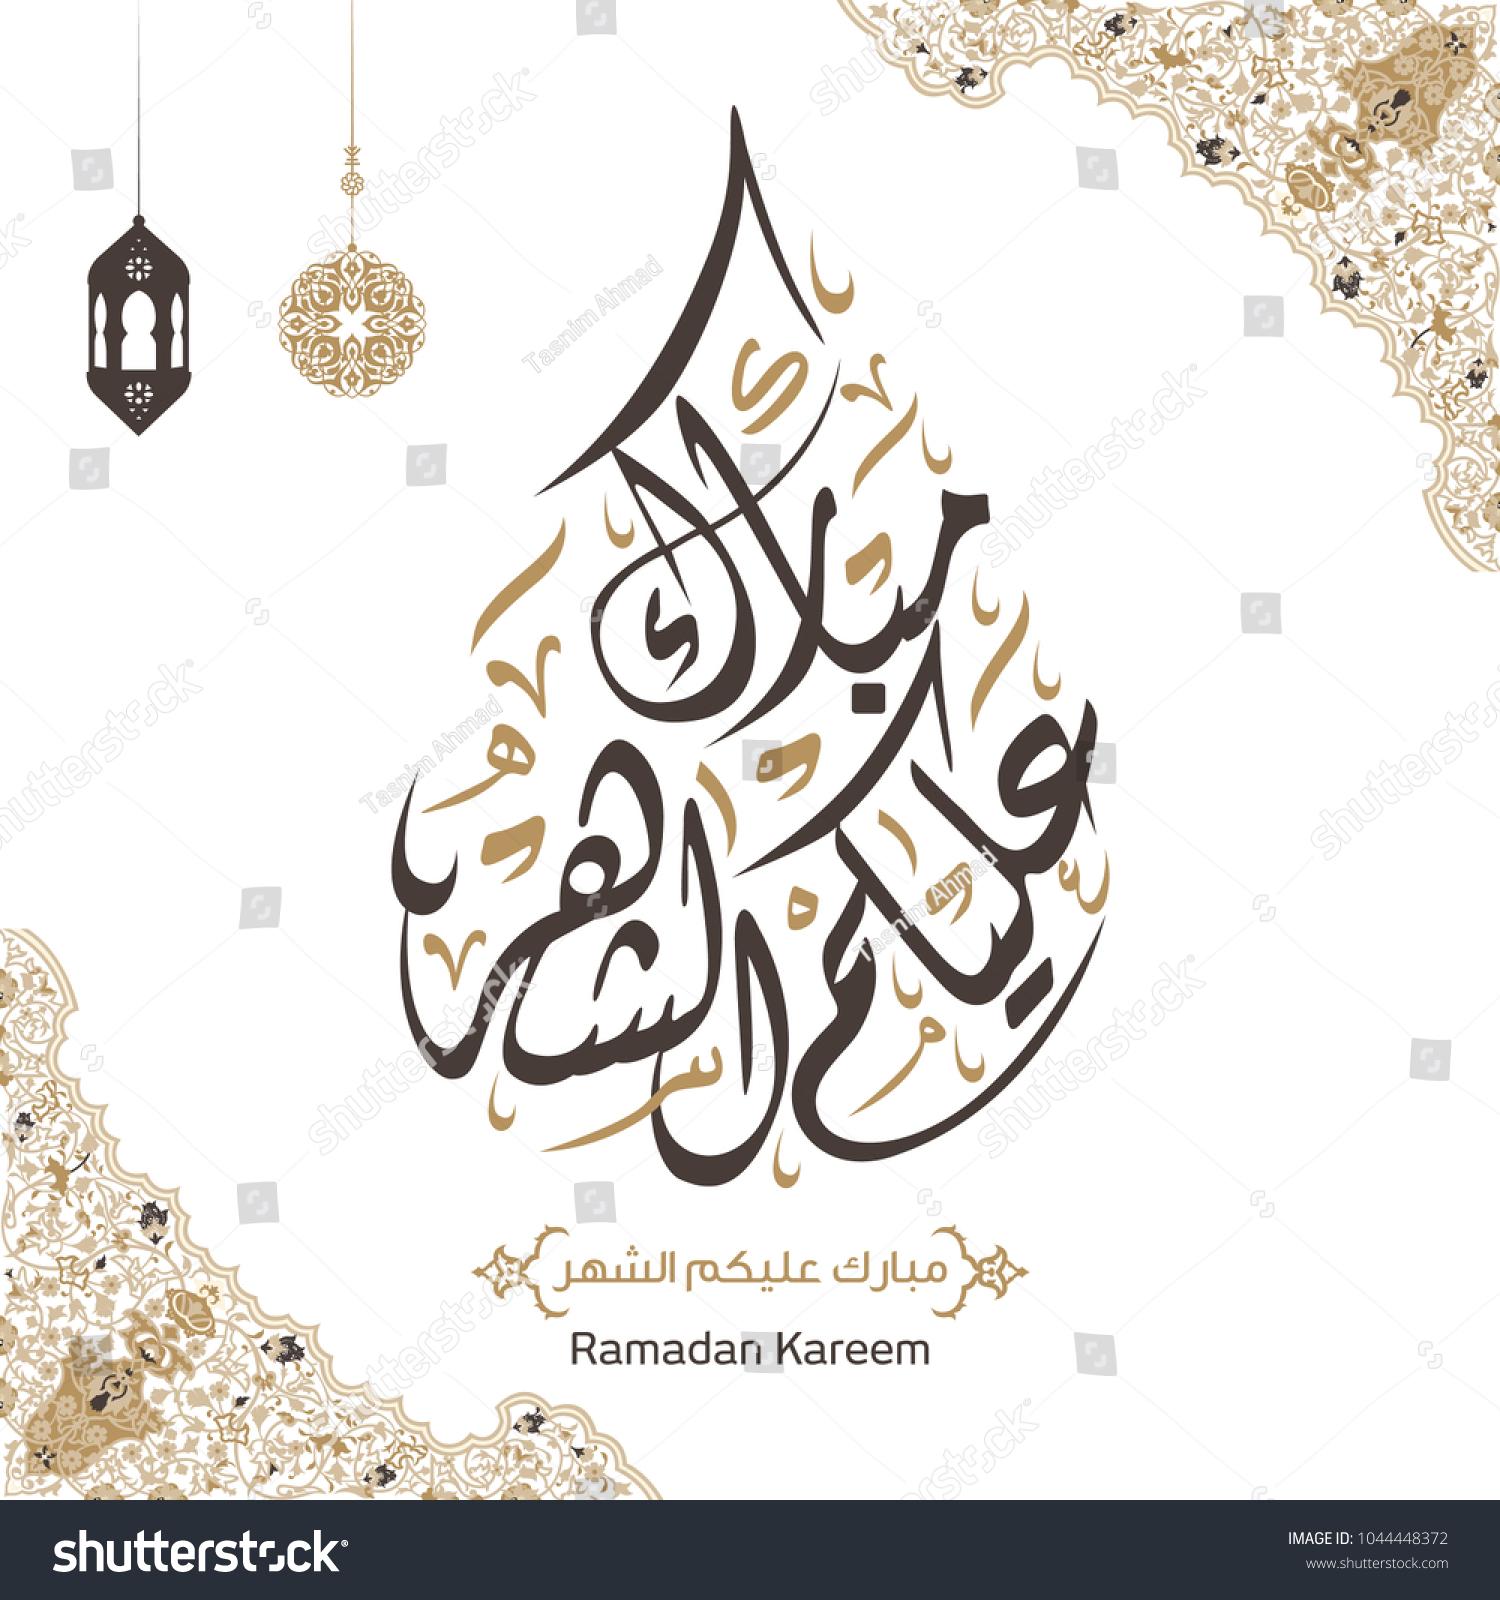 Vector arabic greetings word may you stock vector 1044448372 vector of arabic greetings word may you be well every year 8 kristyandbryce Gallery